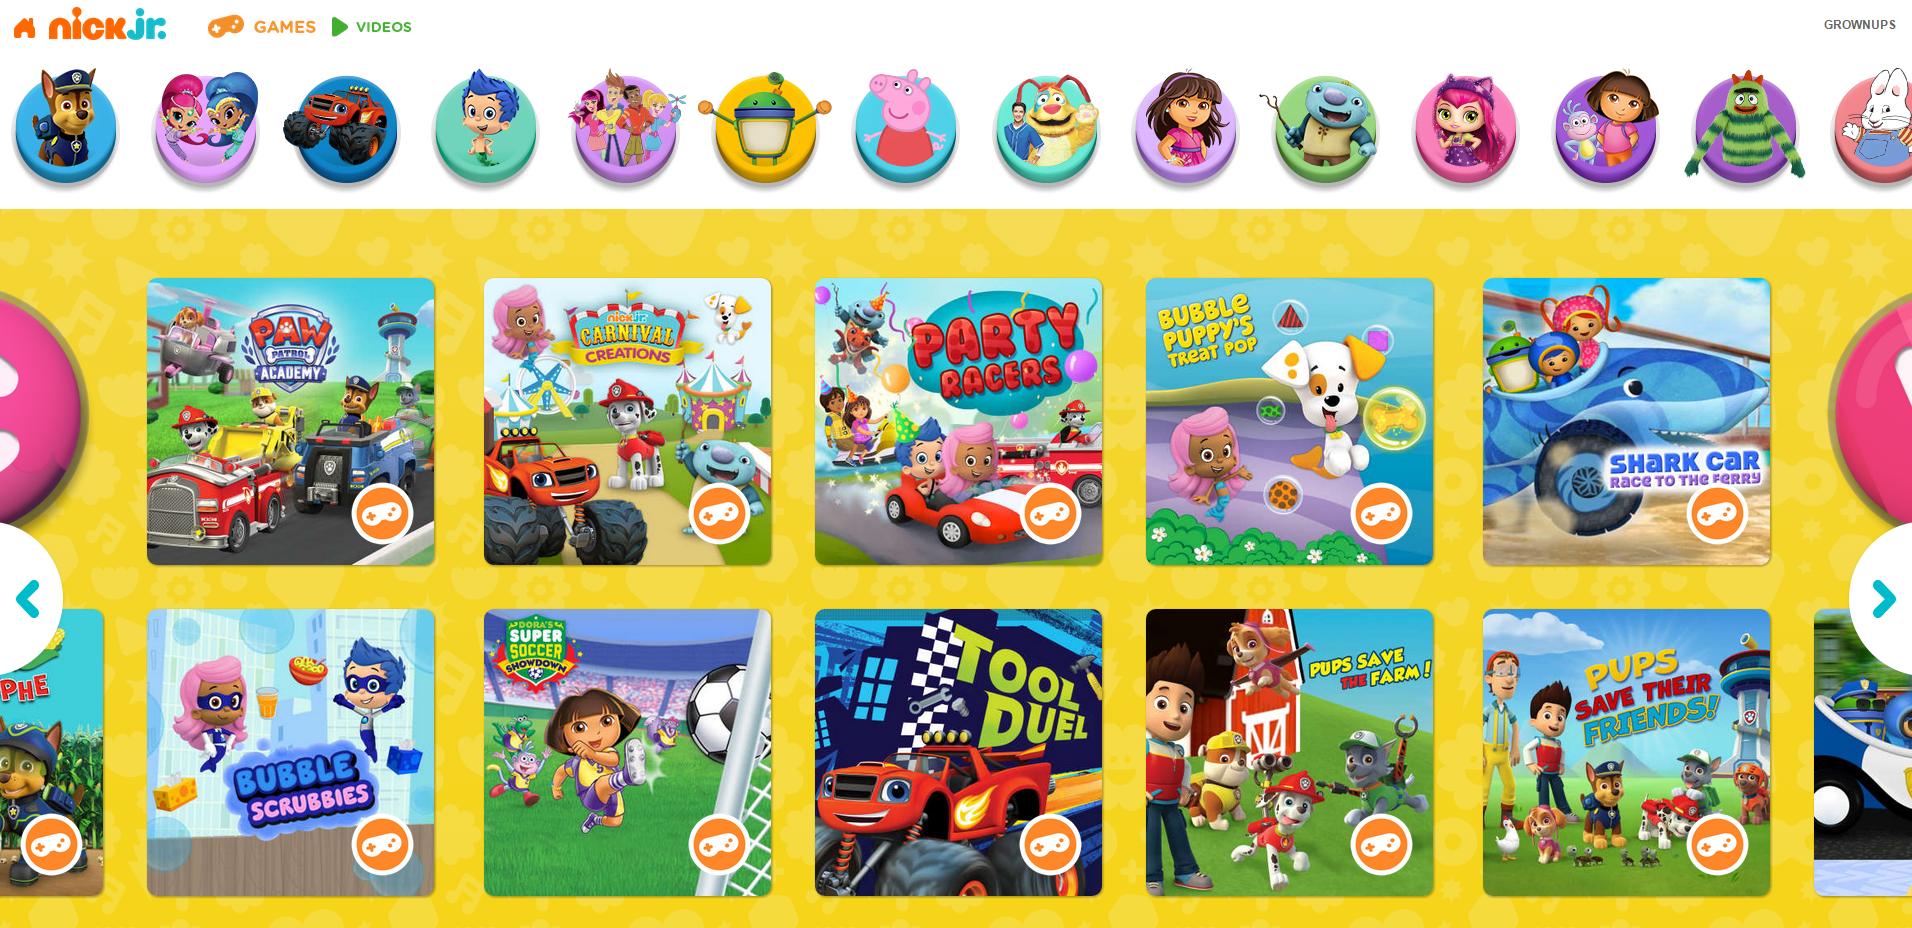 nickjr com preschool games nick jr gallery 973